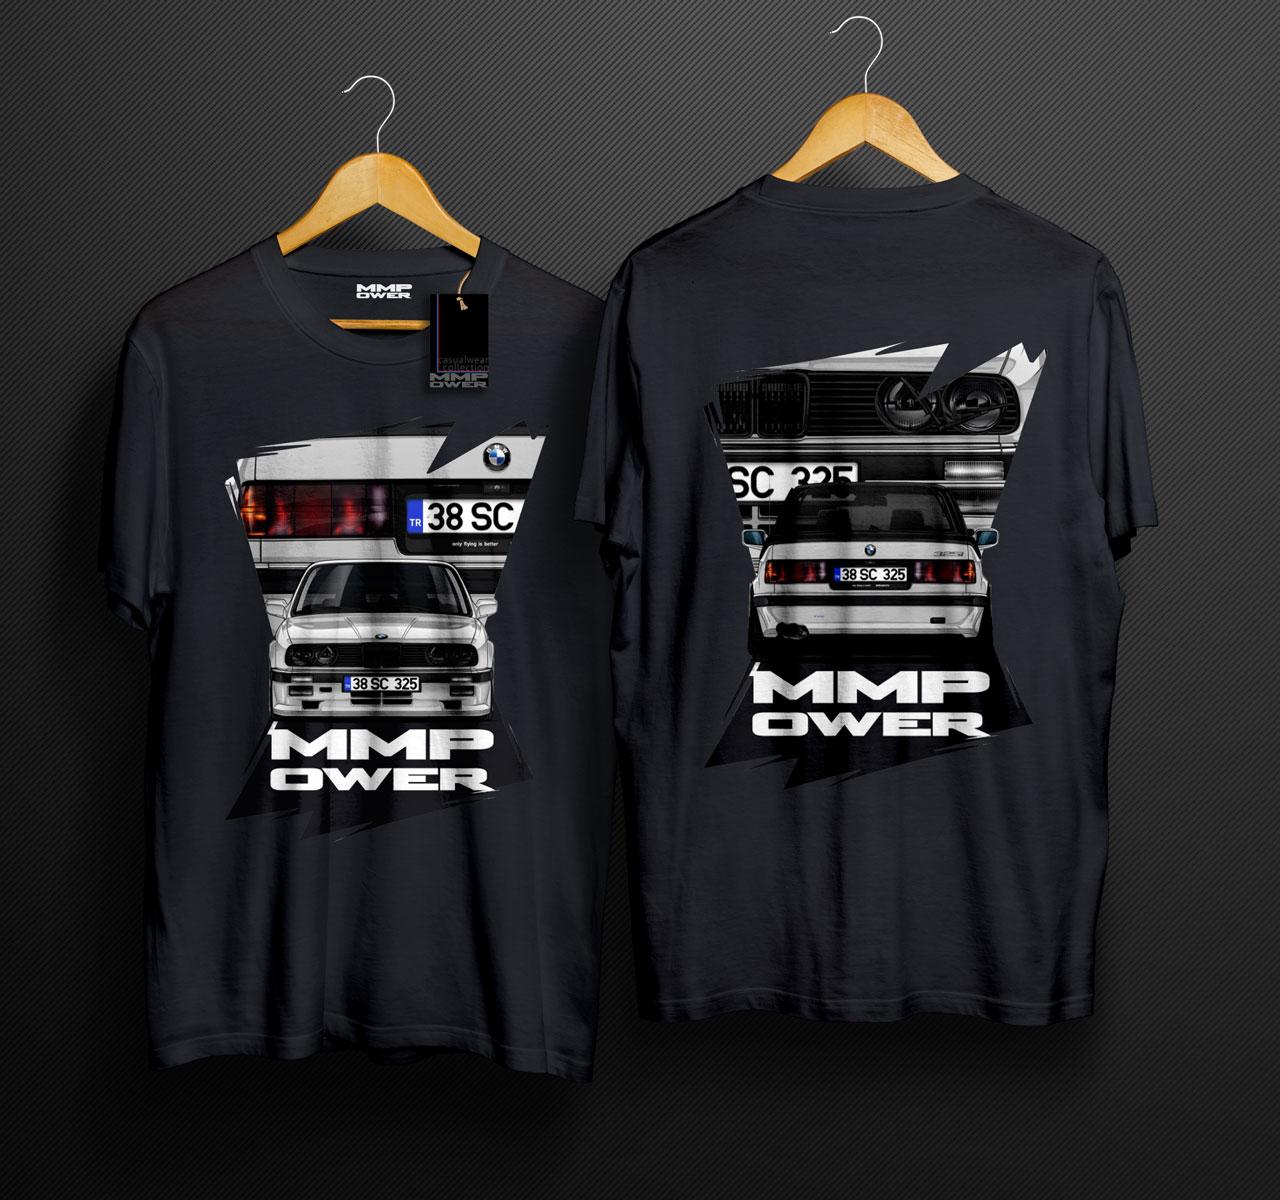 MMPower E30 325i Karekter TShirt Siyah